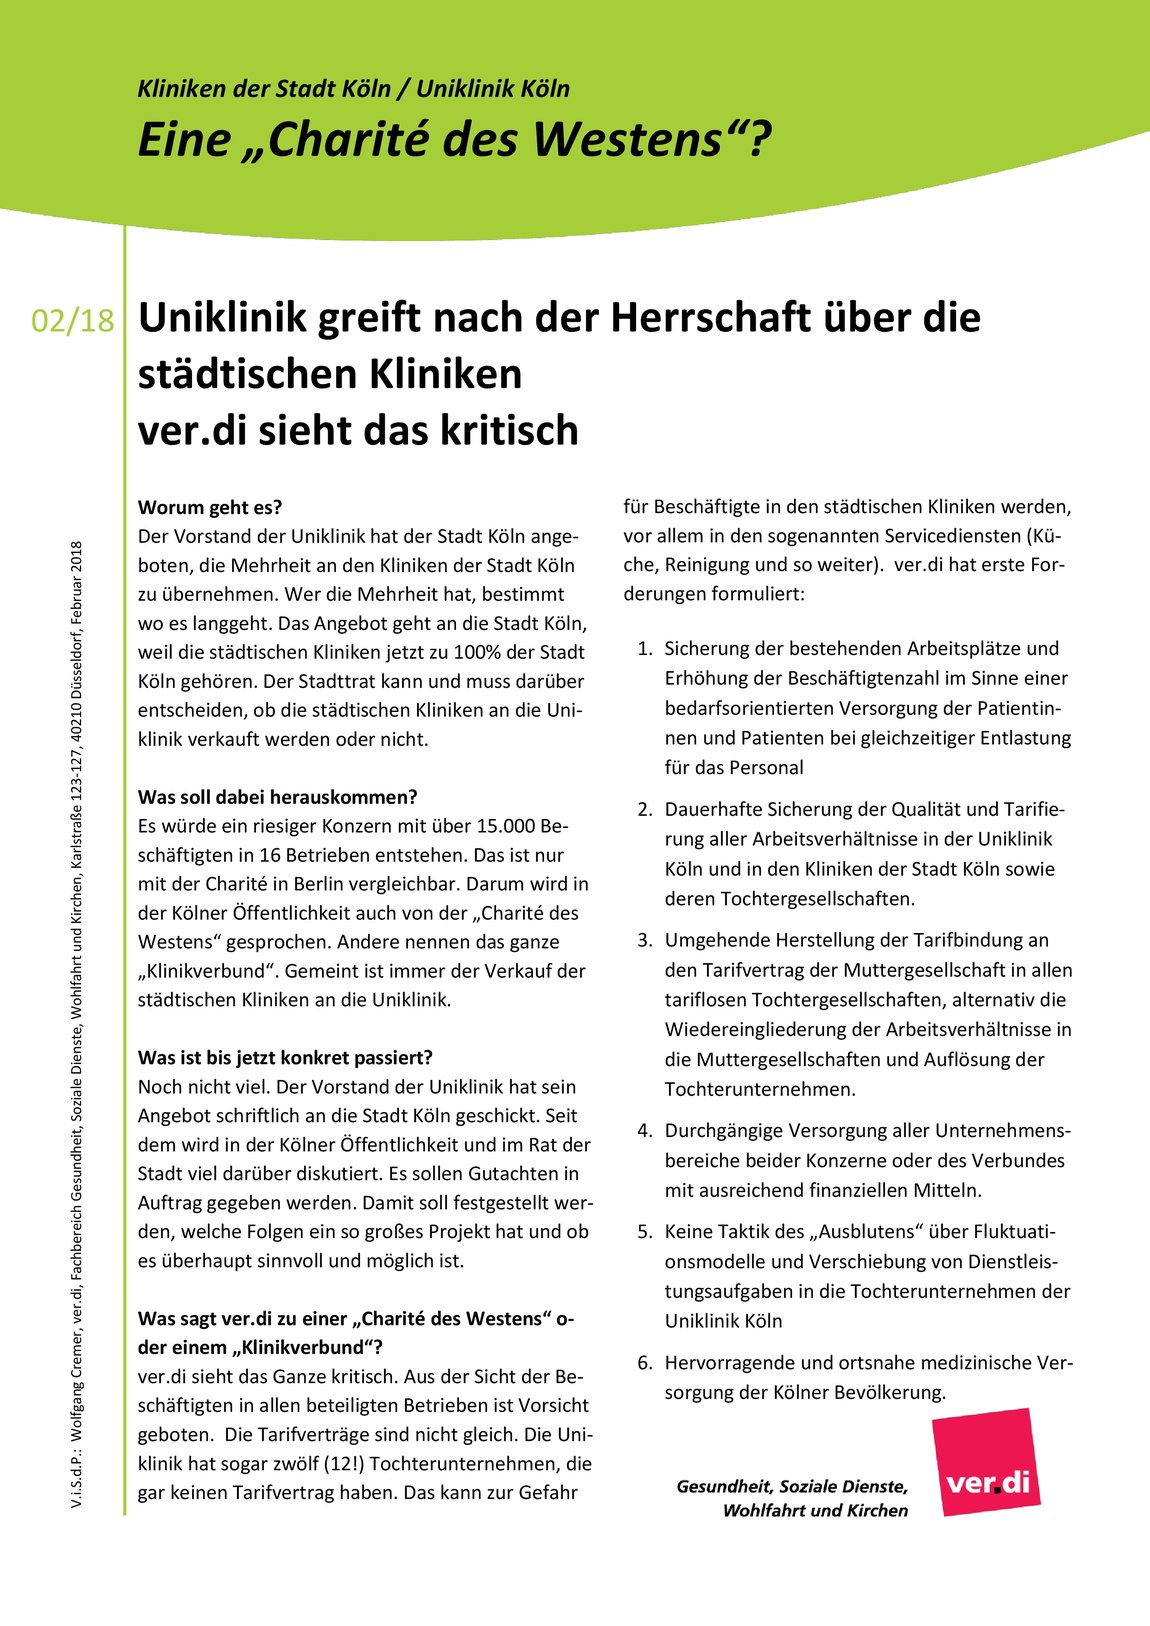 Verdi Flugblatt Klinikverbund Seite 2